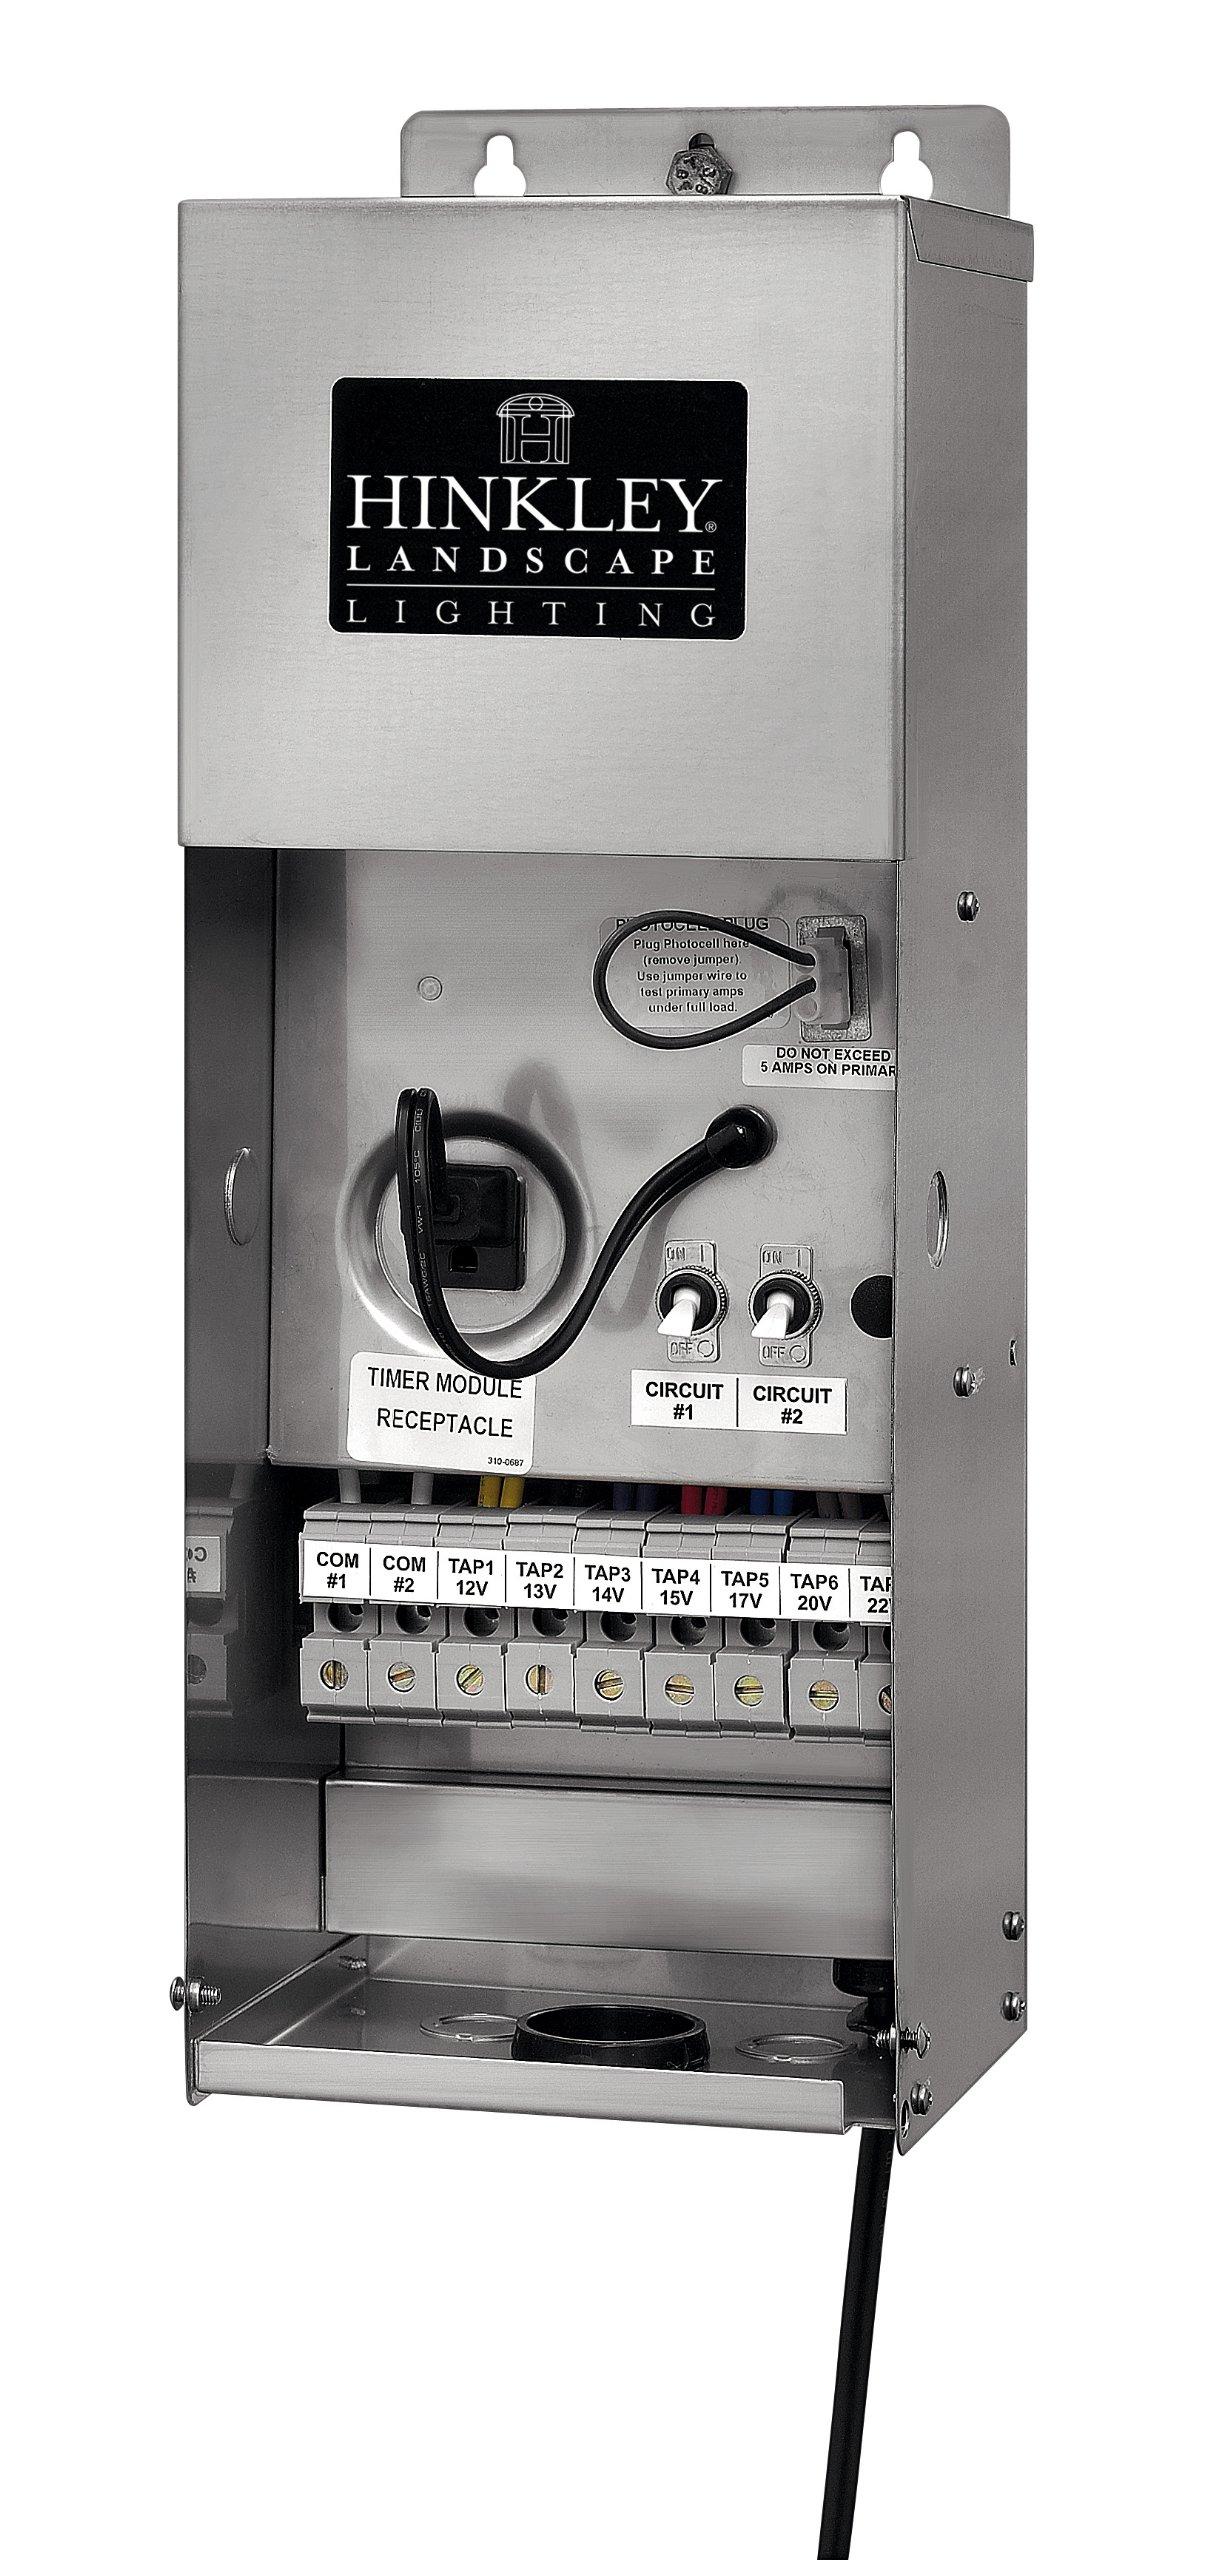 Hinkley Lighting 1222SS Pro Series High Output Multi-Tap 12-12 Volt 1200 Watt Transformer, Stainless Steel